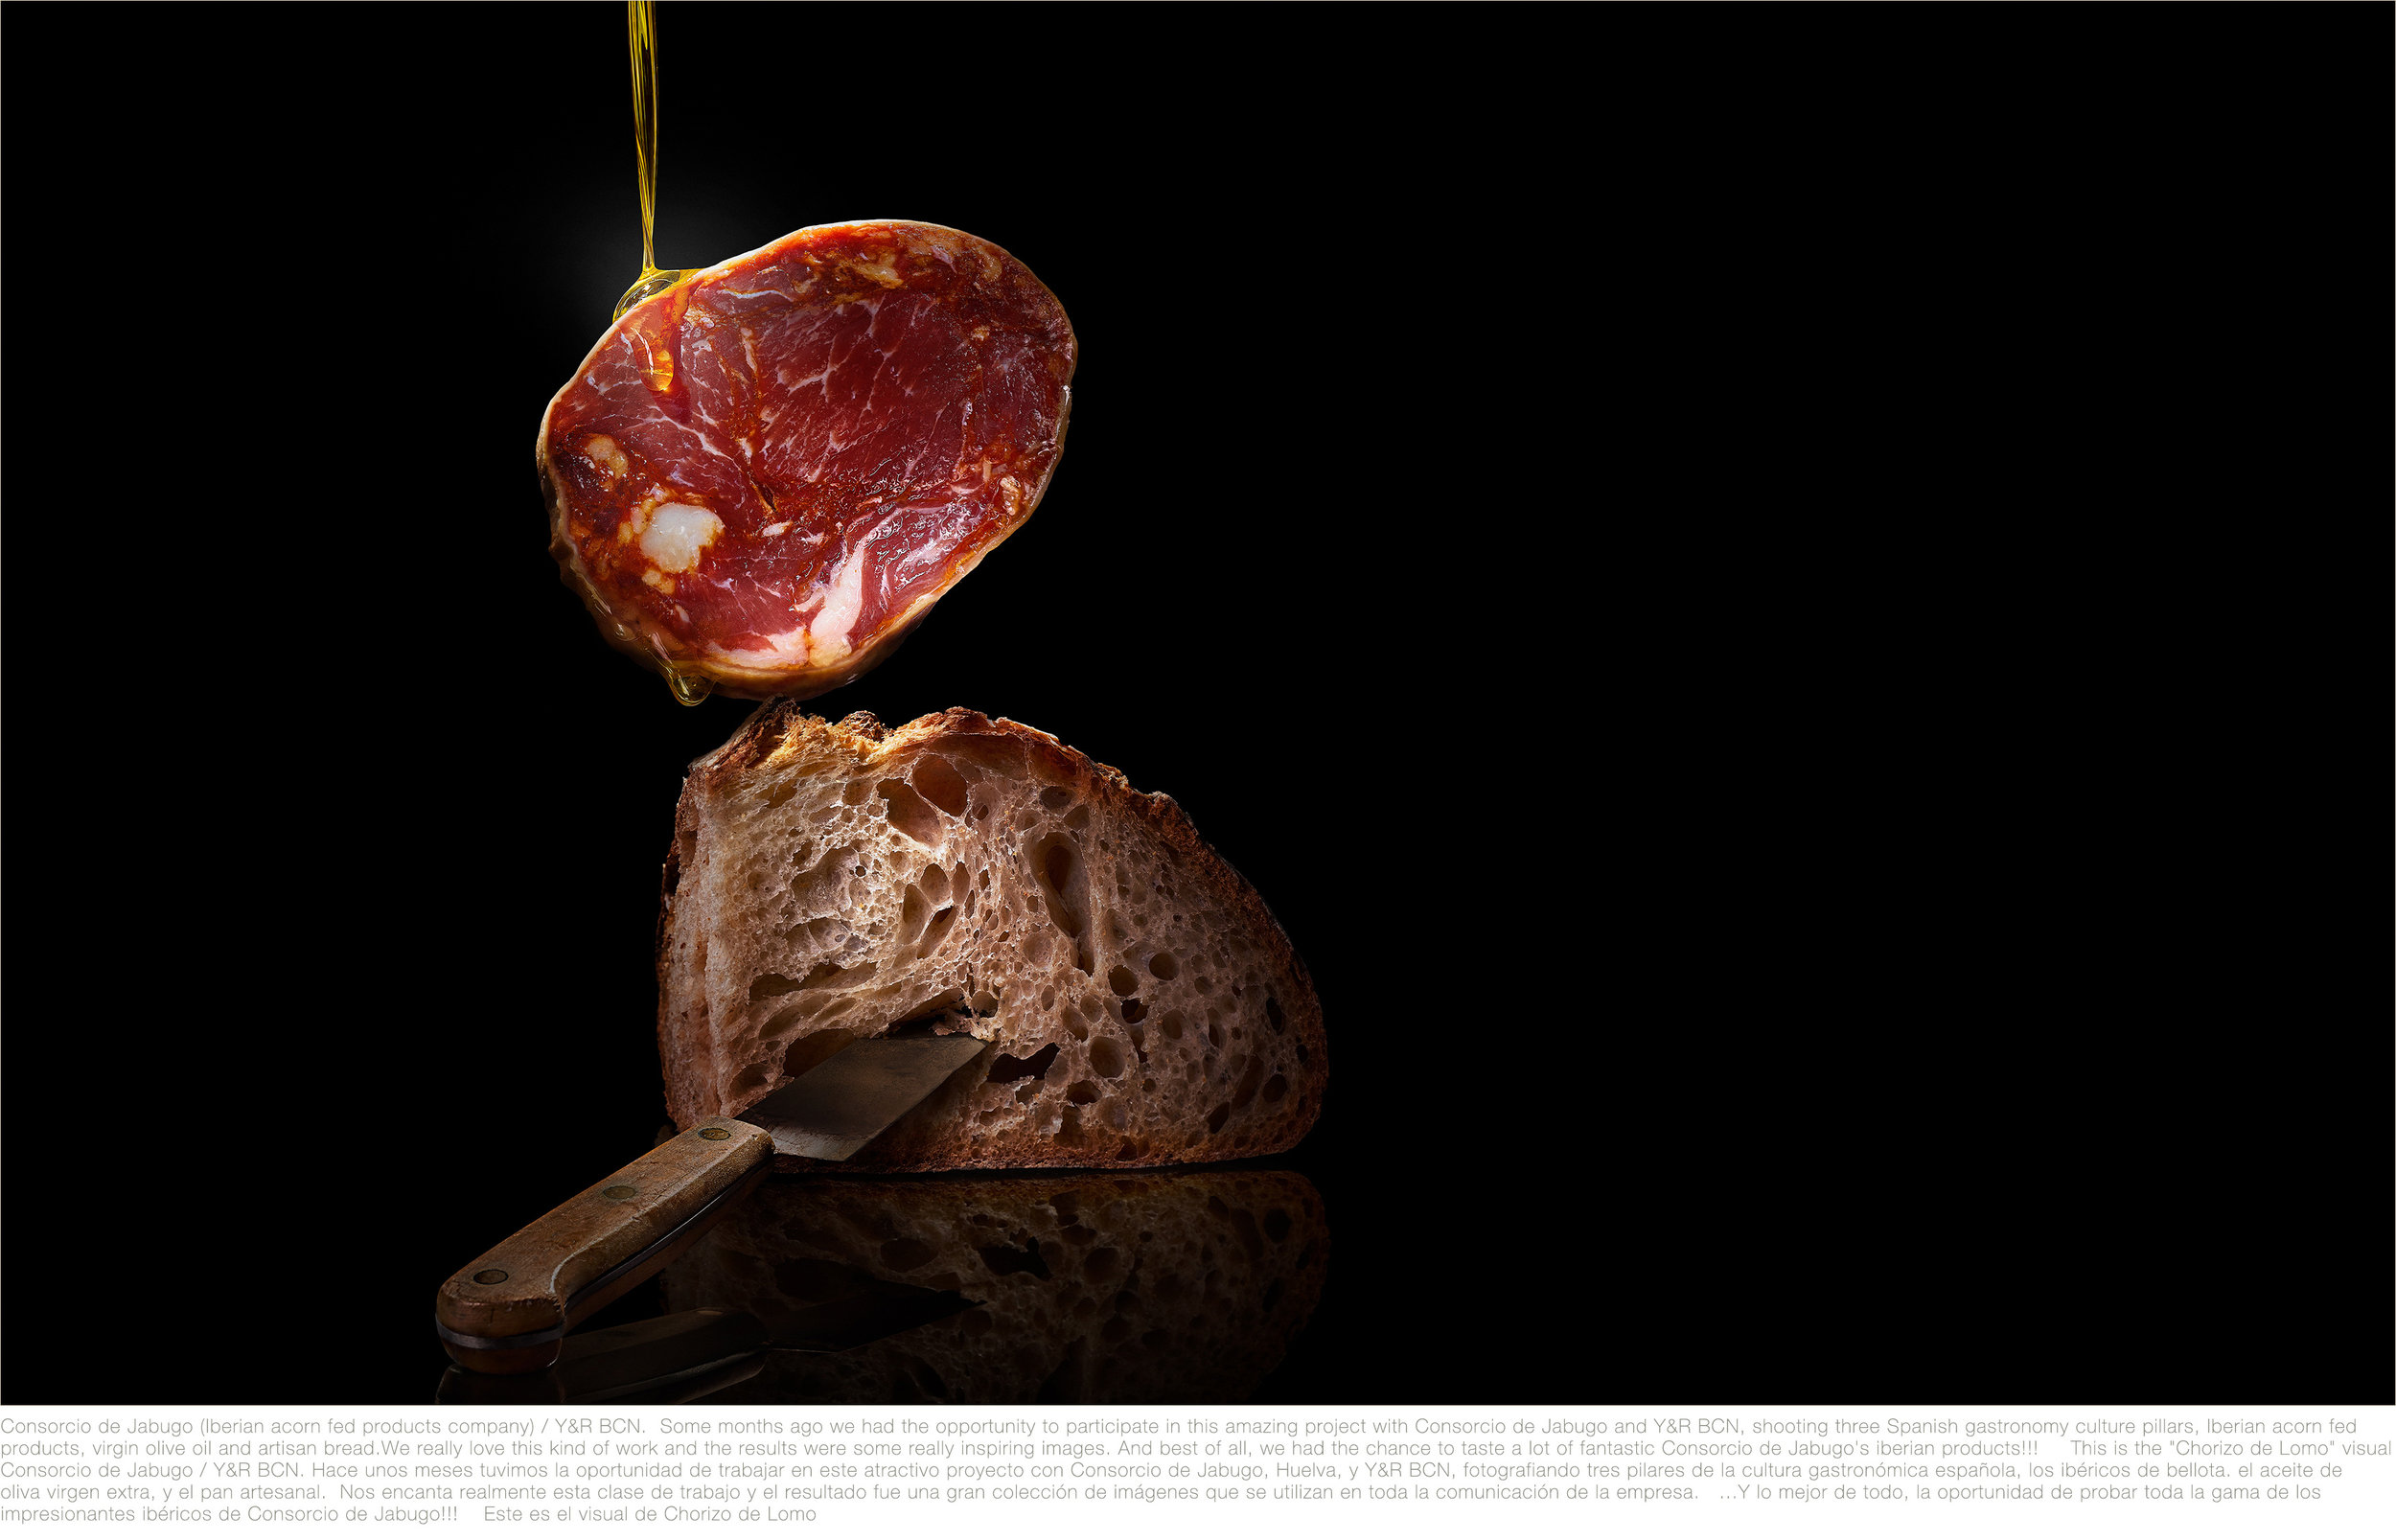 Consorcio-Jabugo-959-Chorizo-Lomo-02-v02.jpg